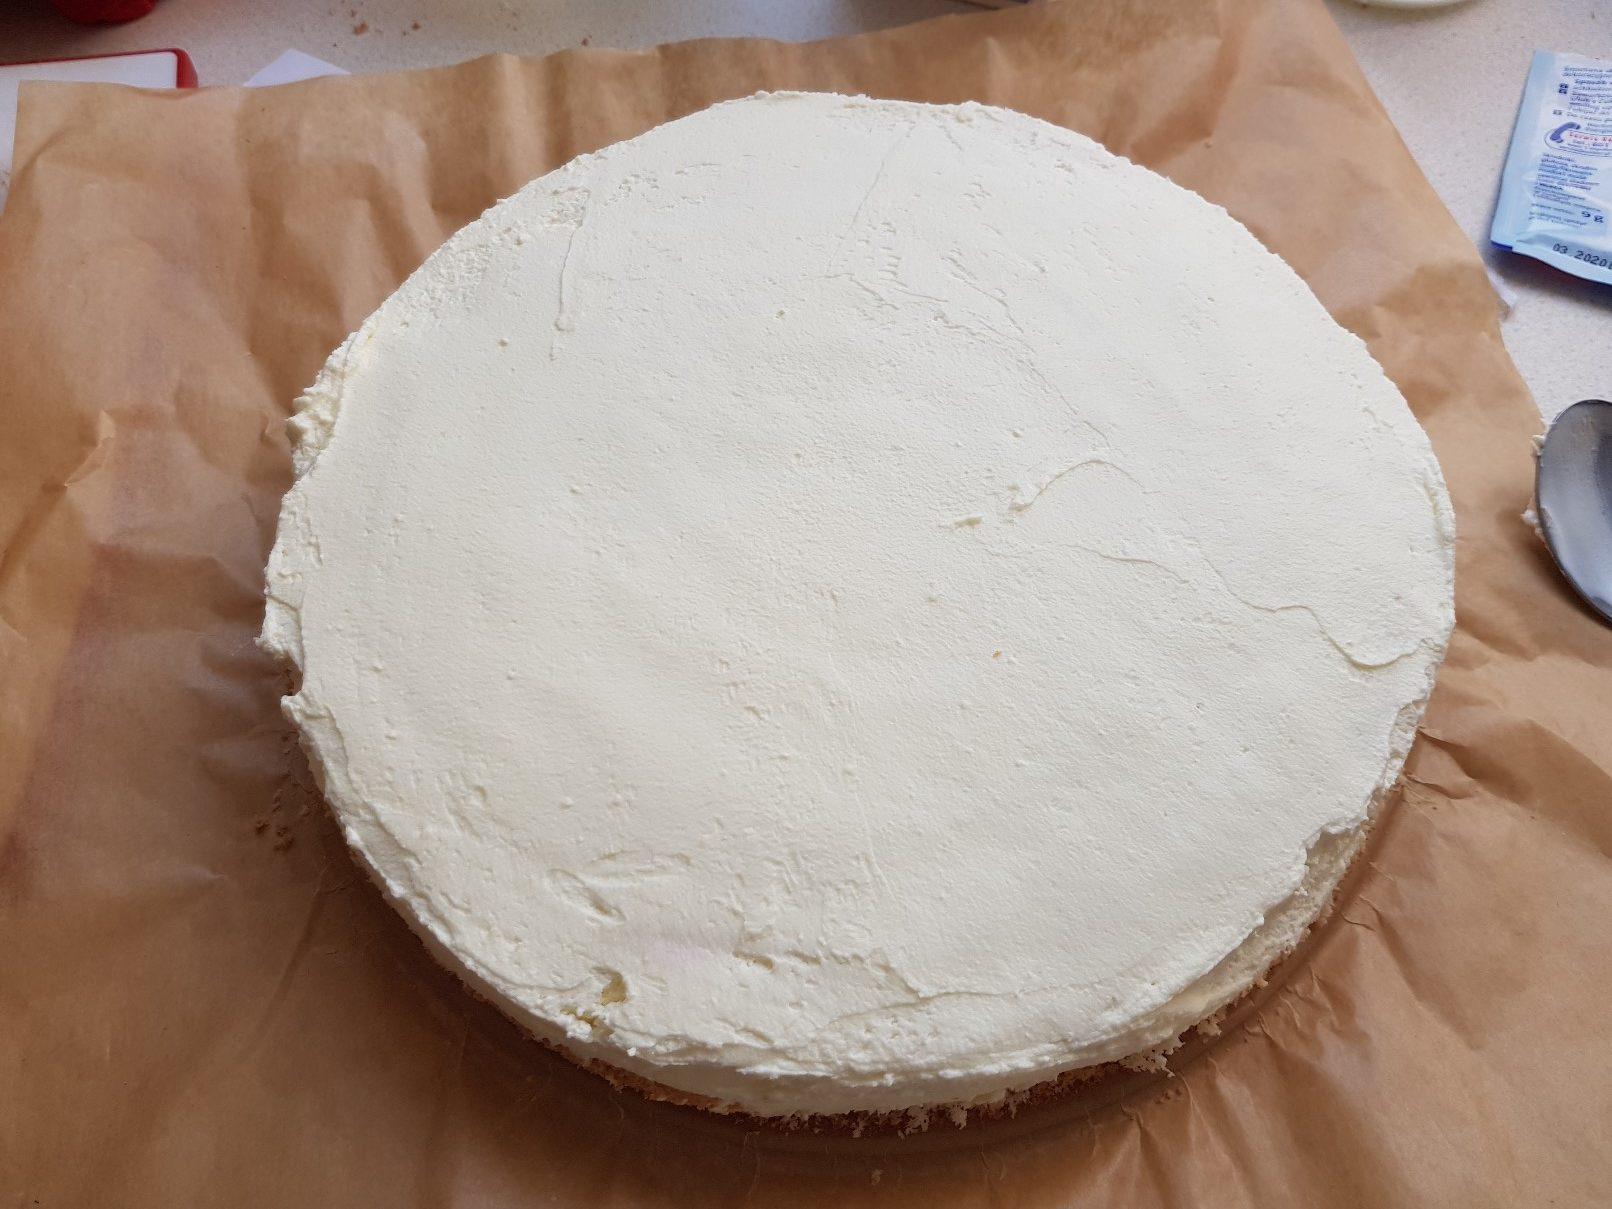 space birthday cake cream filling 3